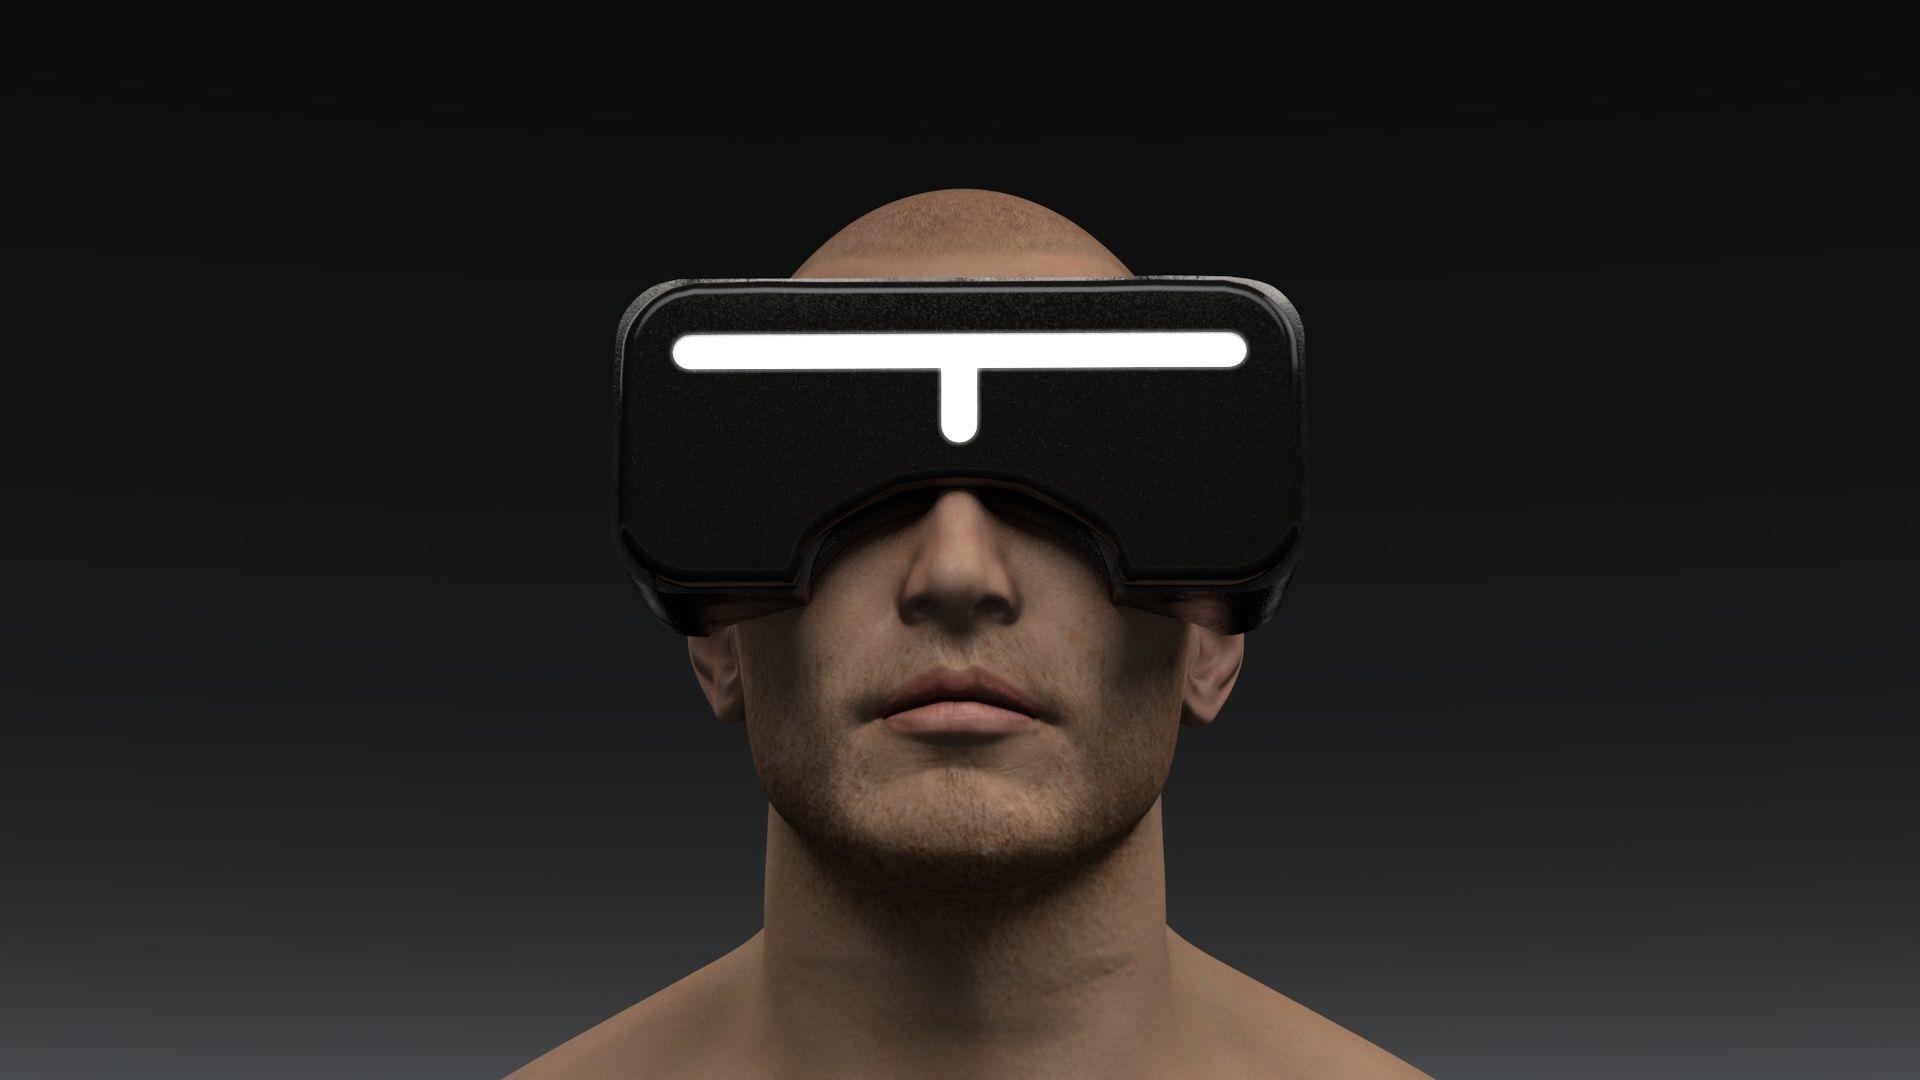 Sci Fi Virtual Reality Headset